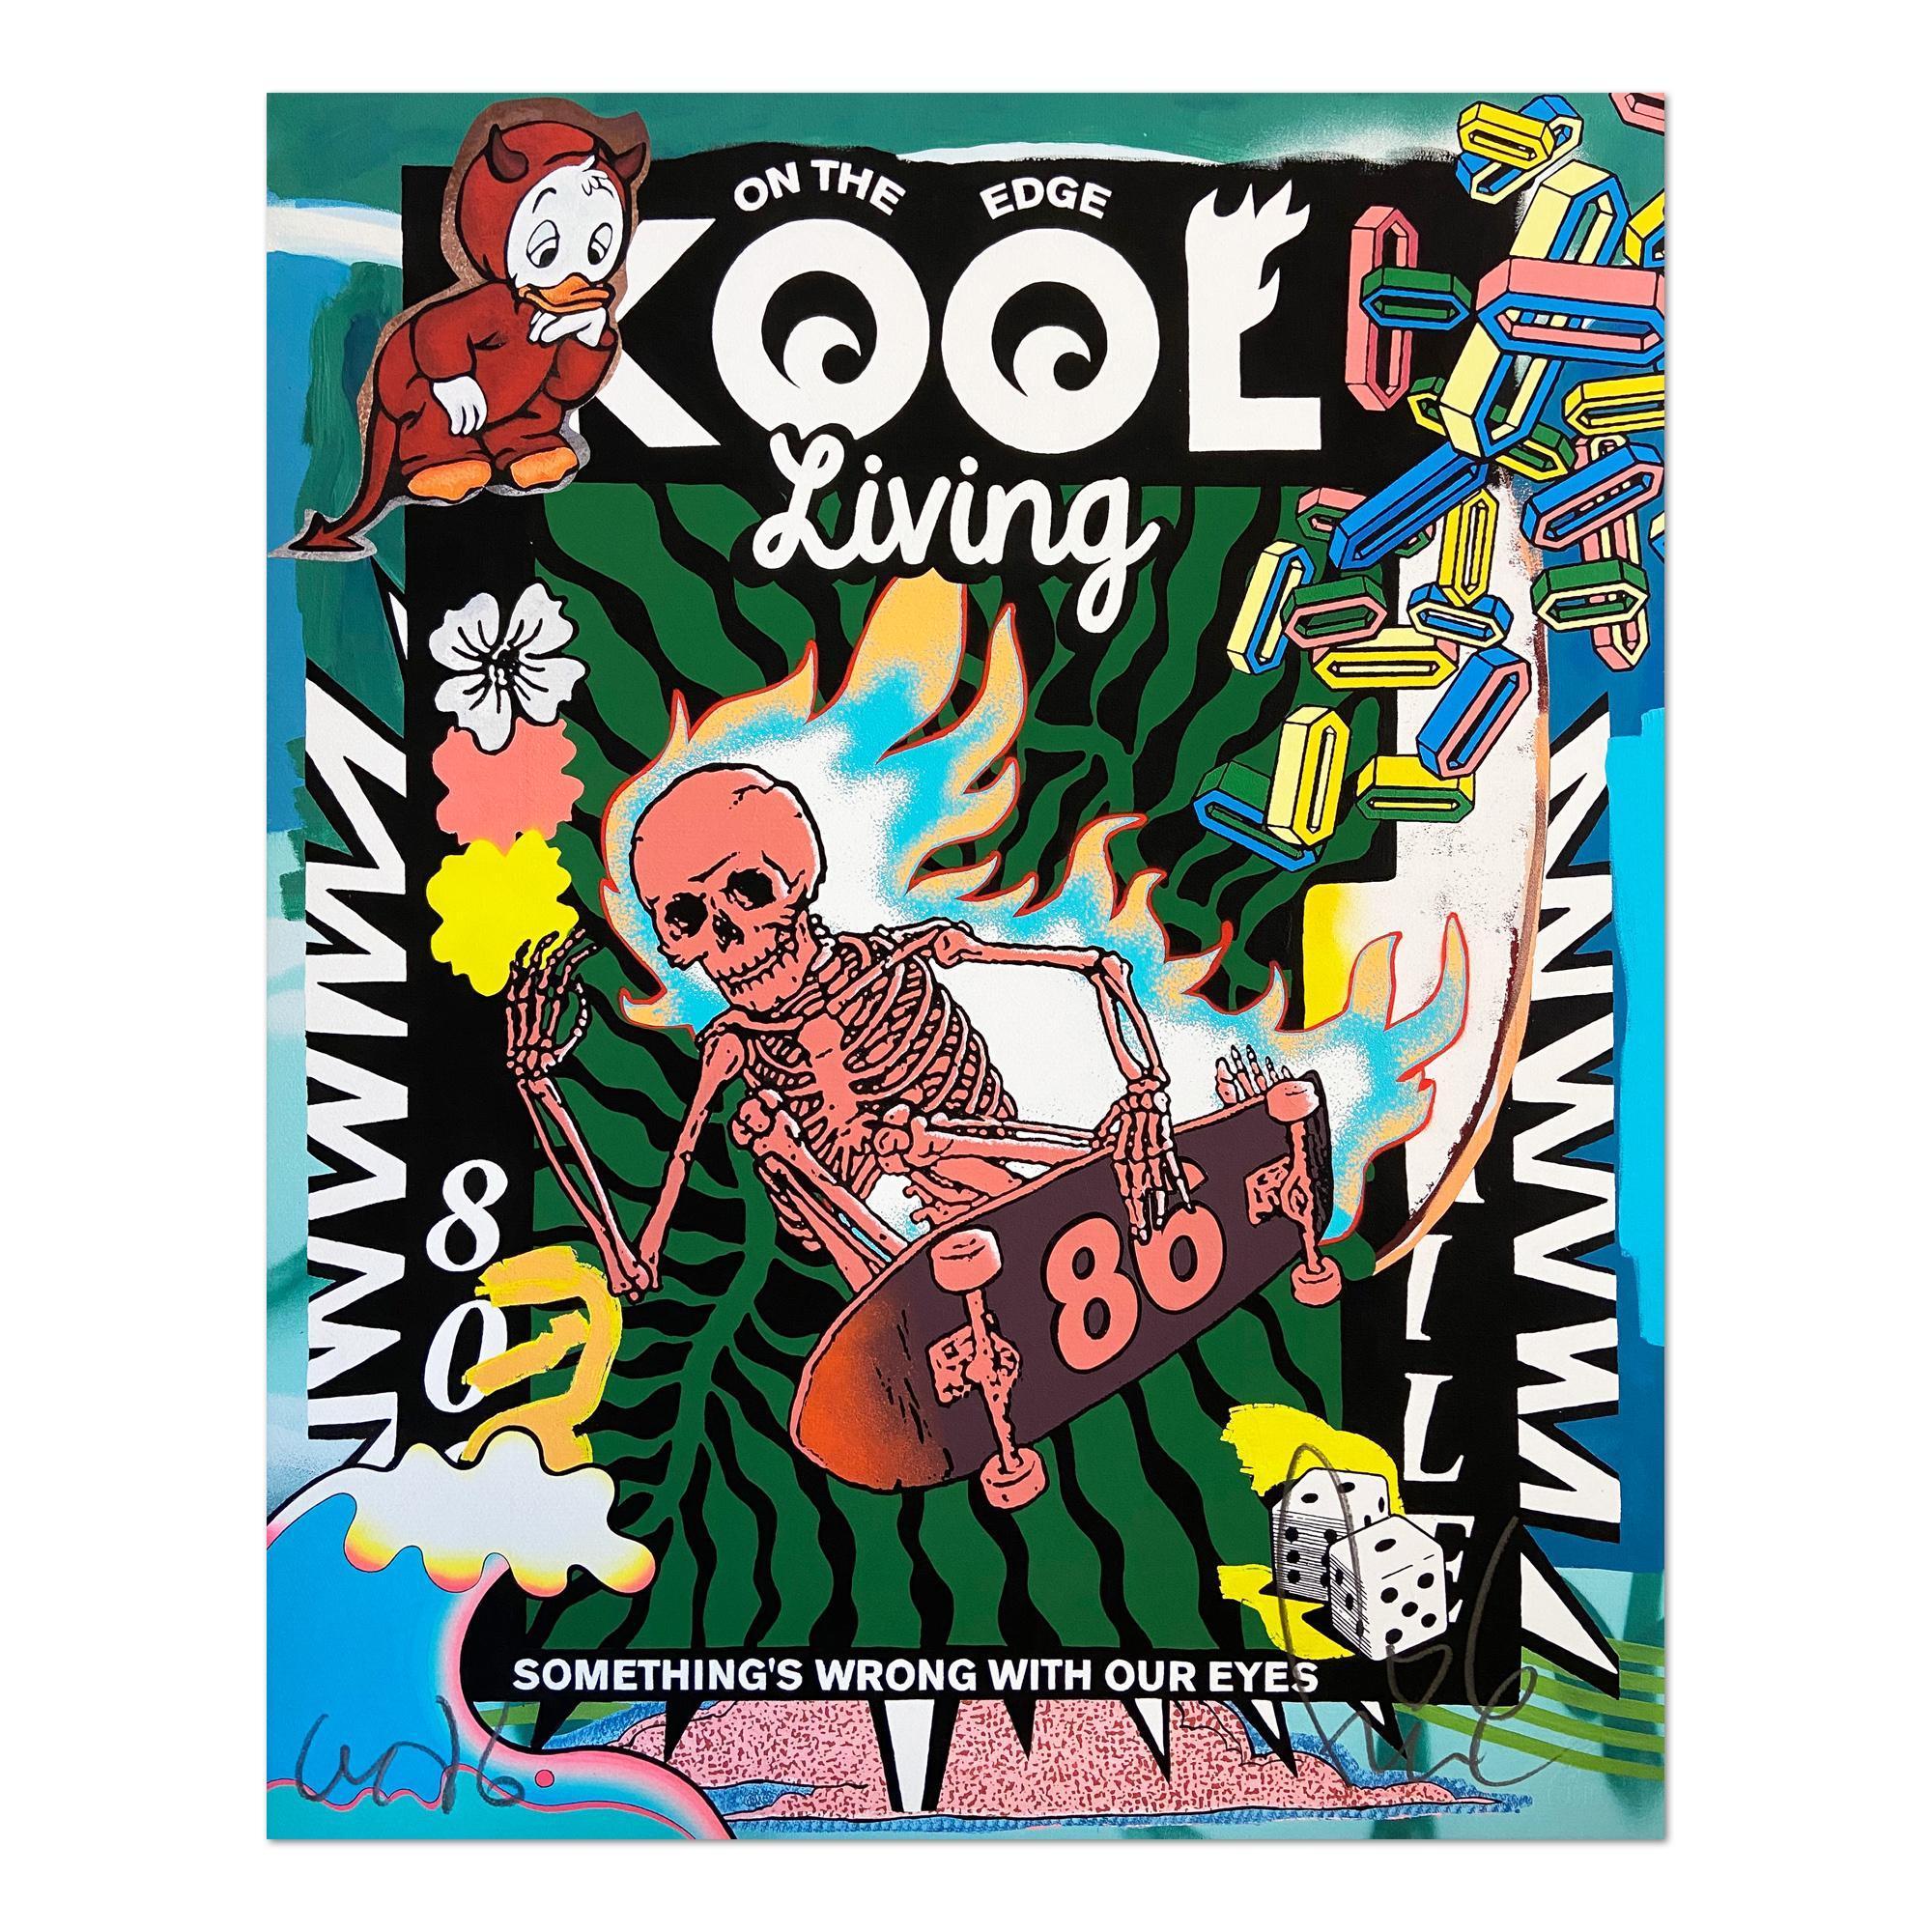 Kool Living, Street Art, Urban Art, Graffiti